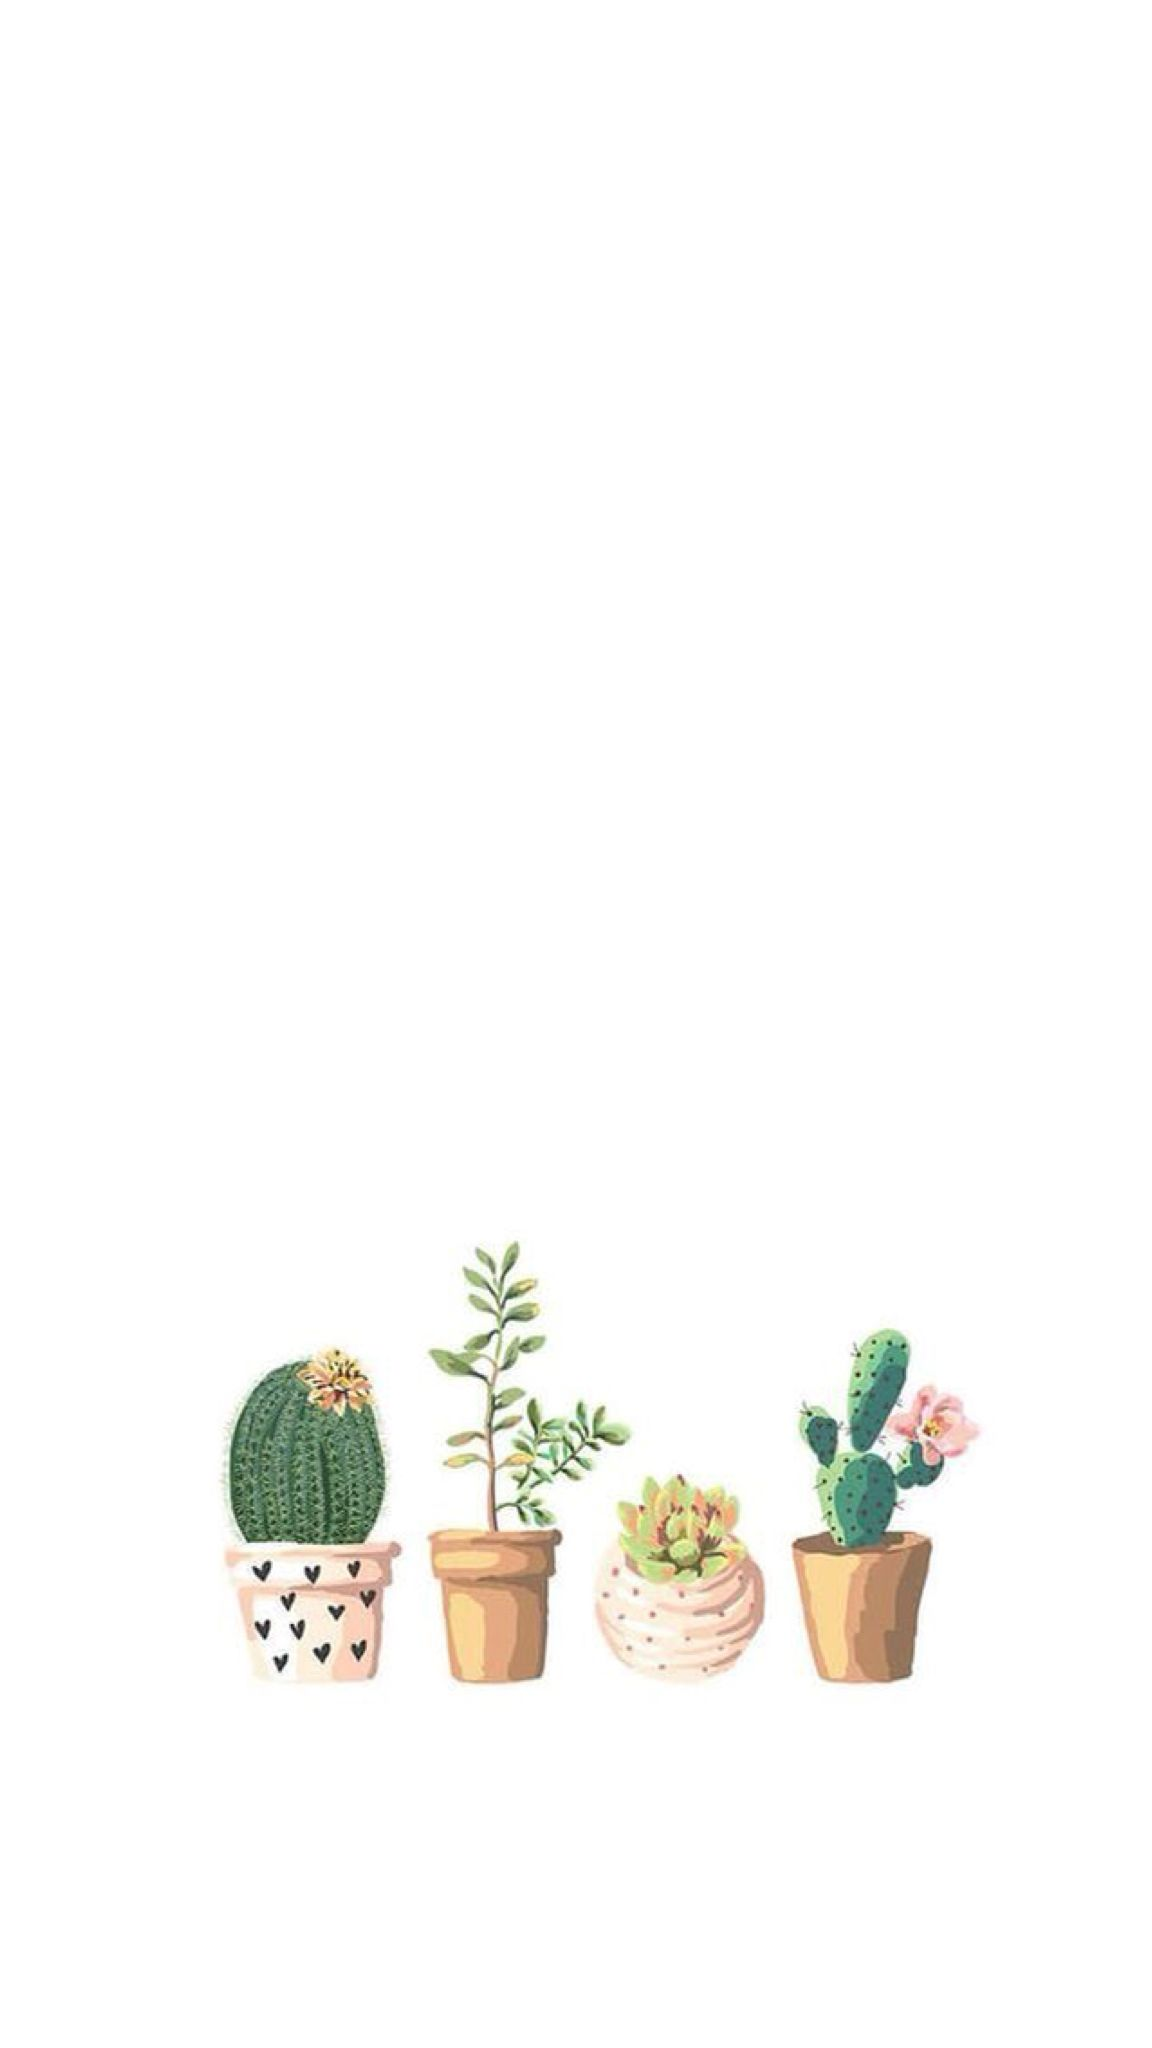 Wall paper Paper wallpaper, Plant wallpaper, Backgrounds